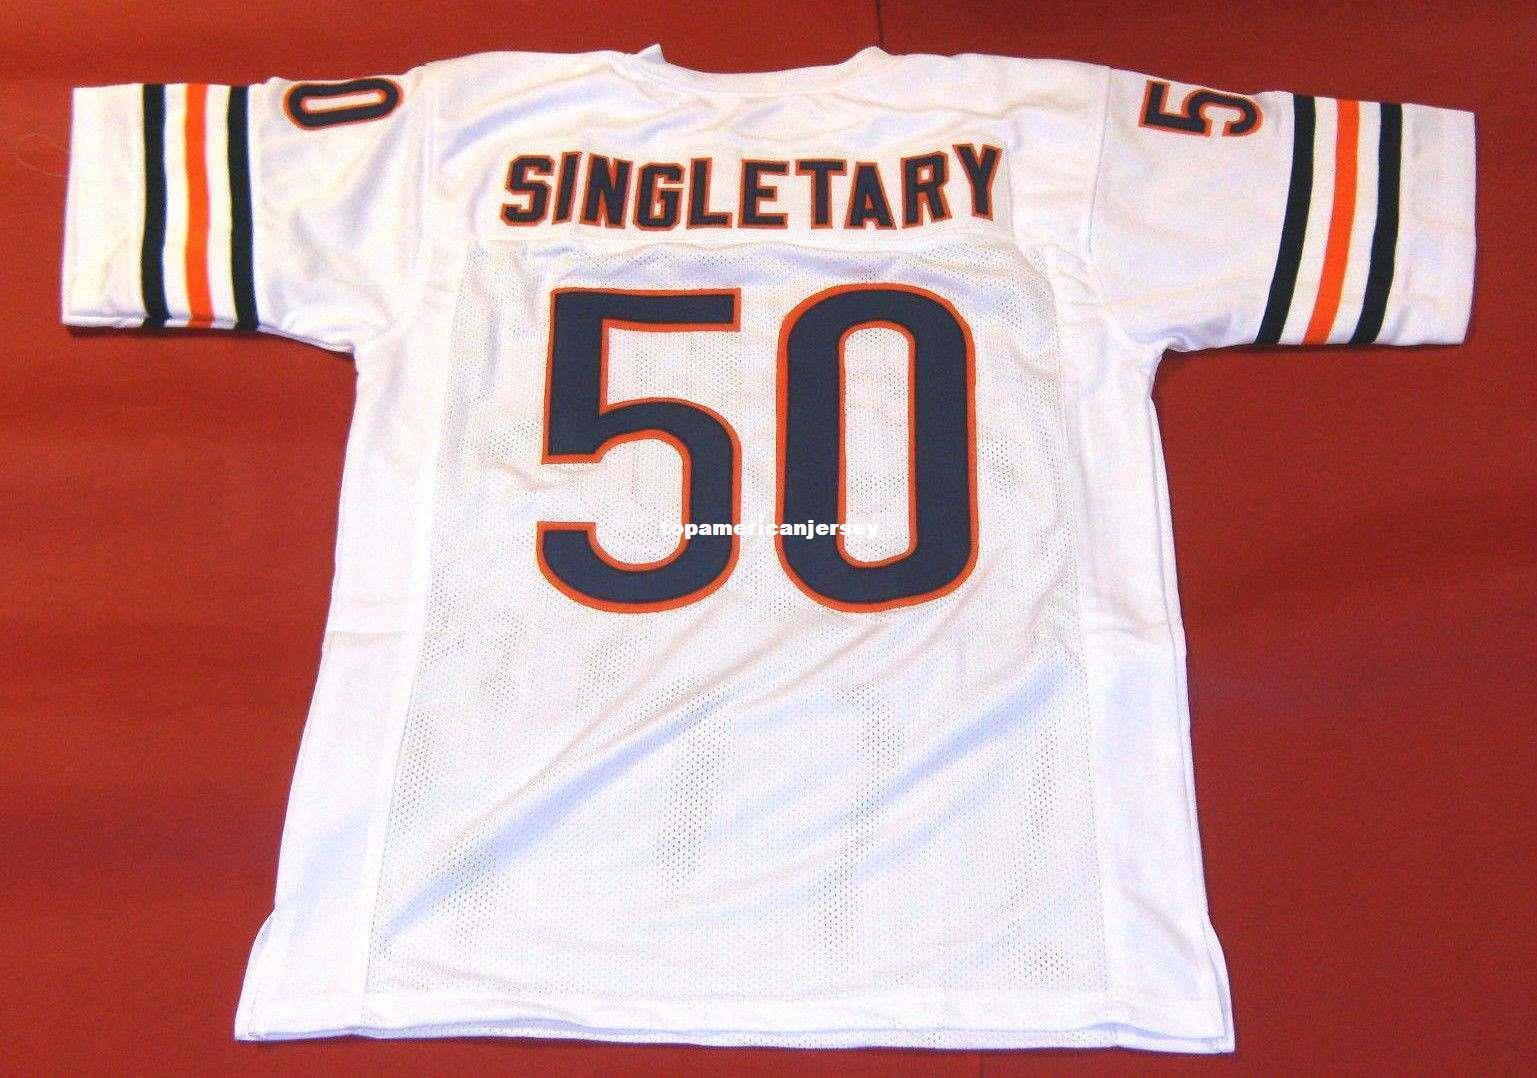 Cheap retro # 50 Mike Singletary CUSTOM MITCHELL NESS Jersey branco Mens costura superior S-5XL, 6XL Football Jerseys de duração